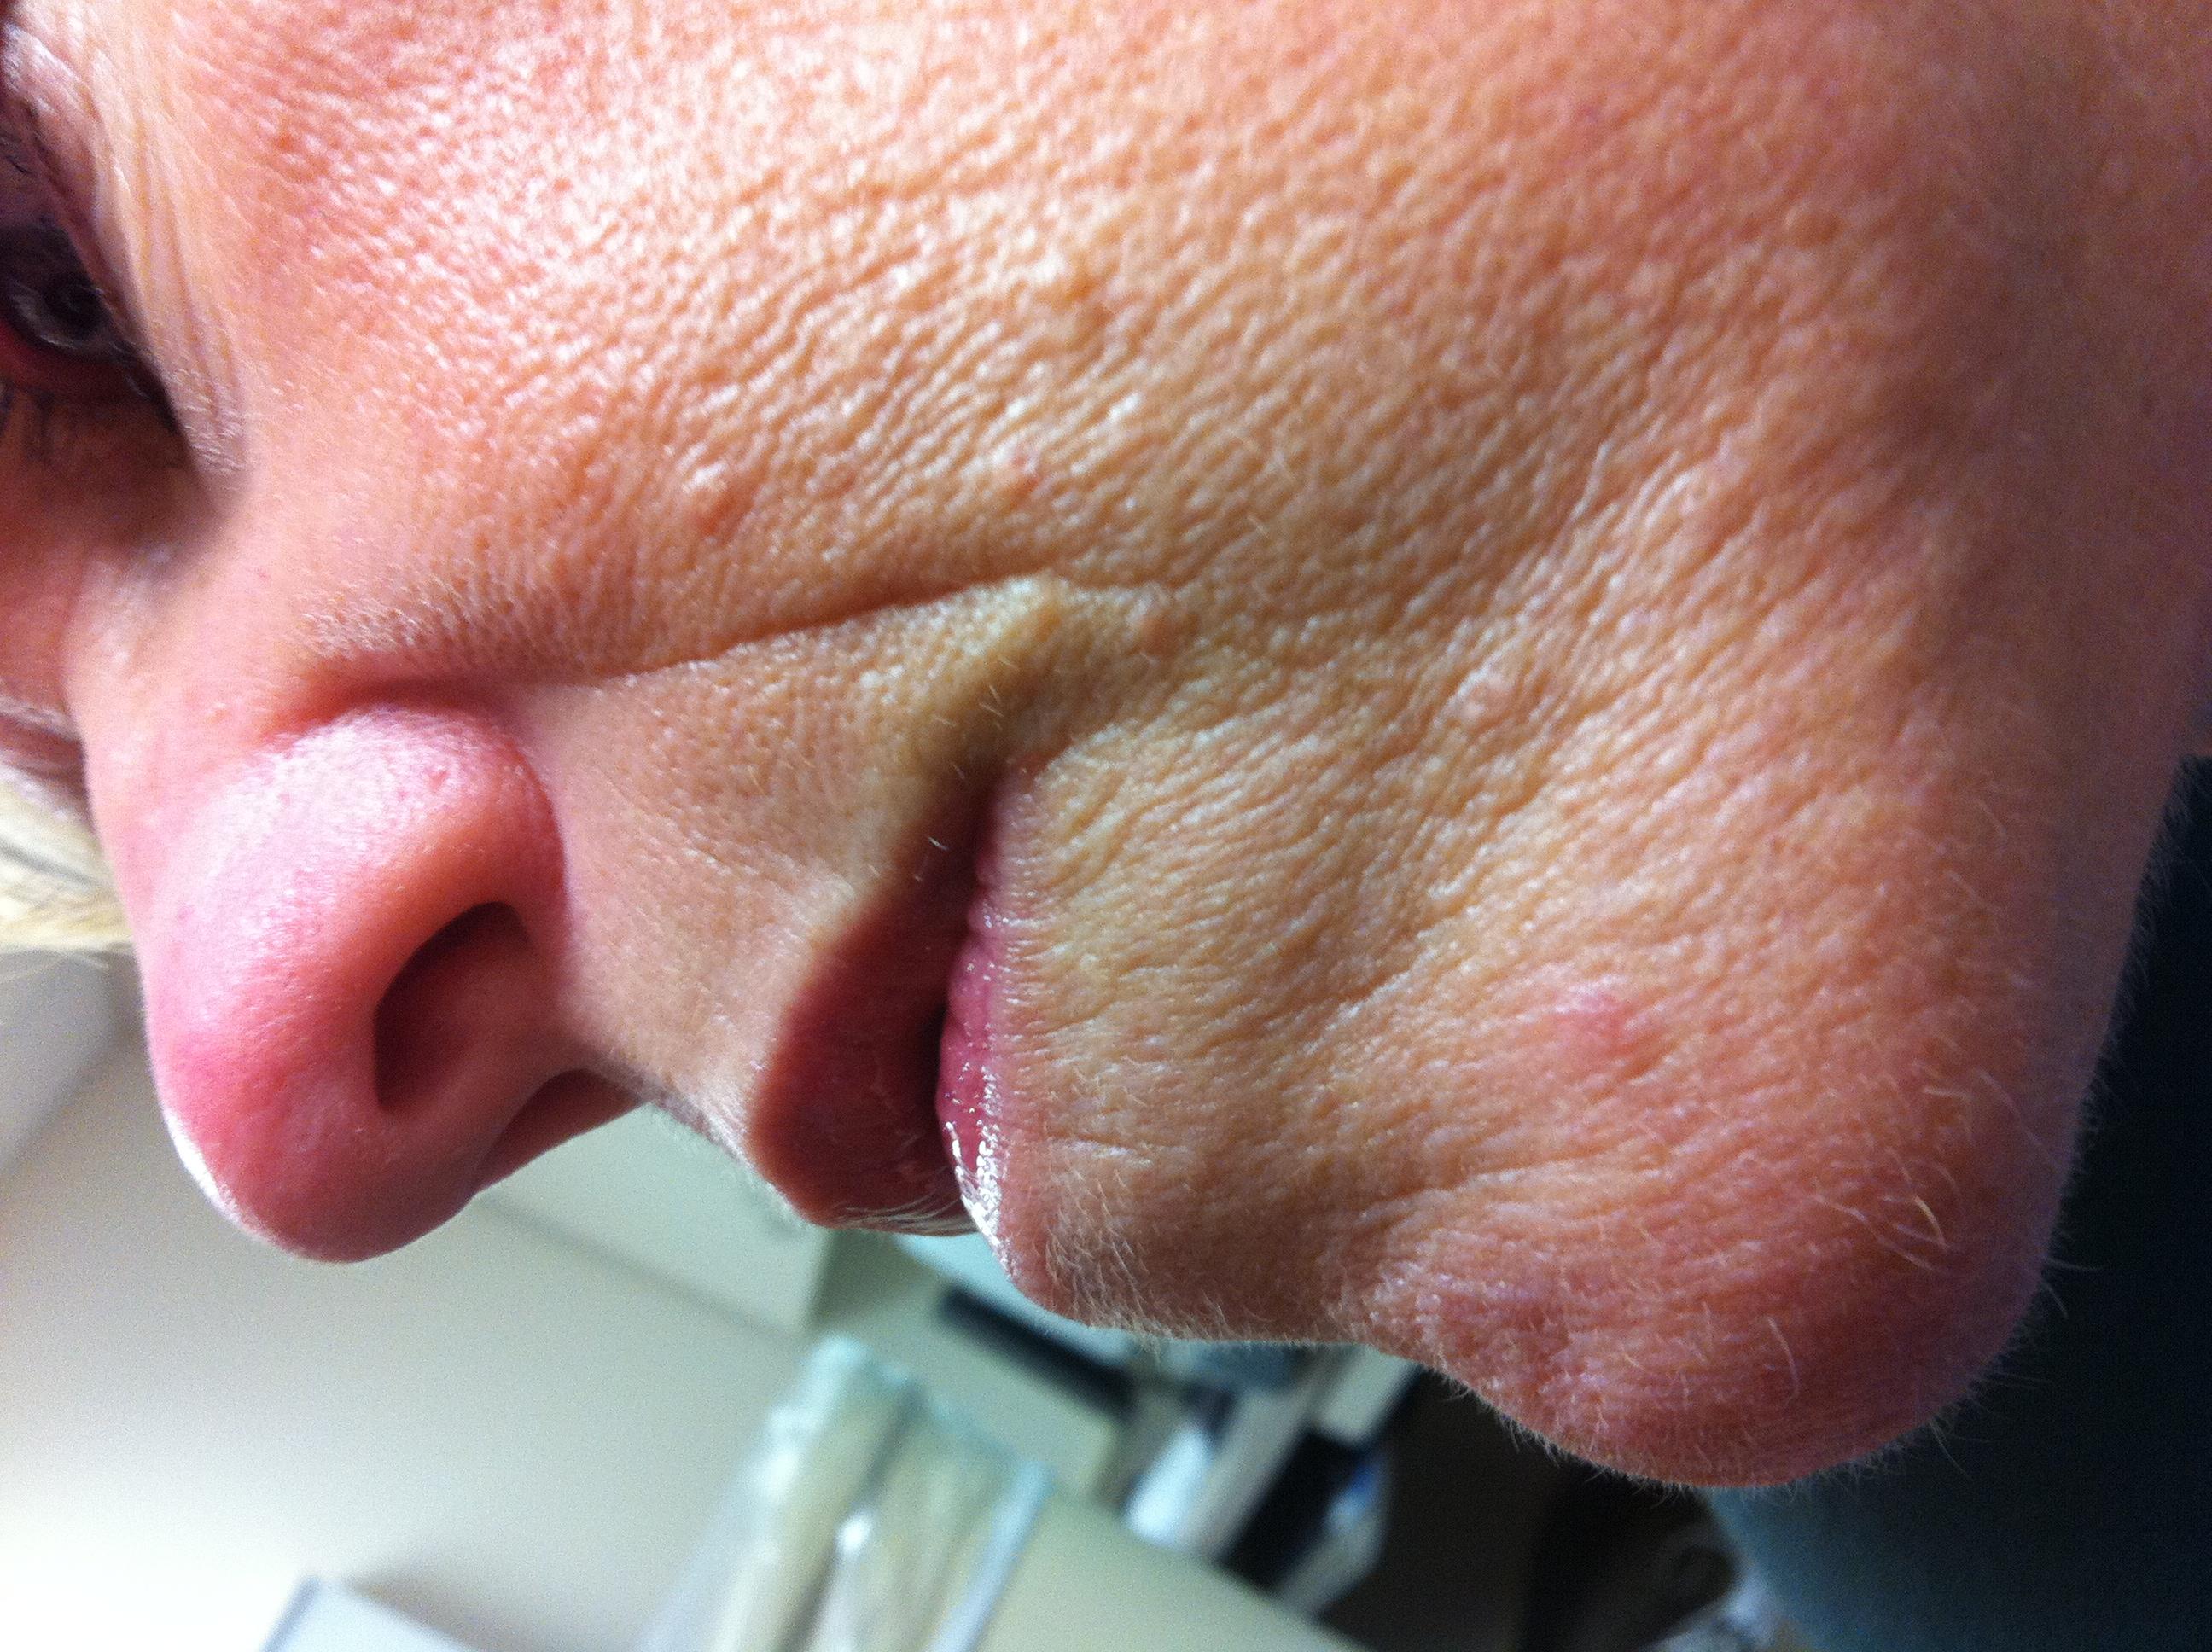 Rash on face under bottom lip